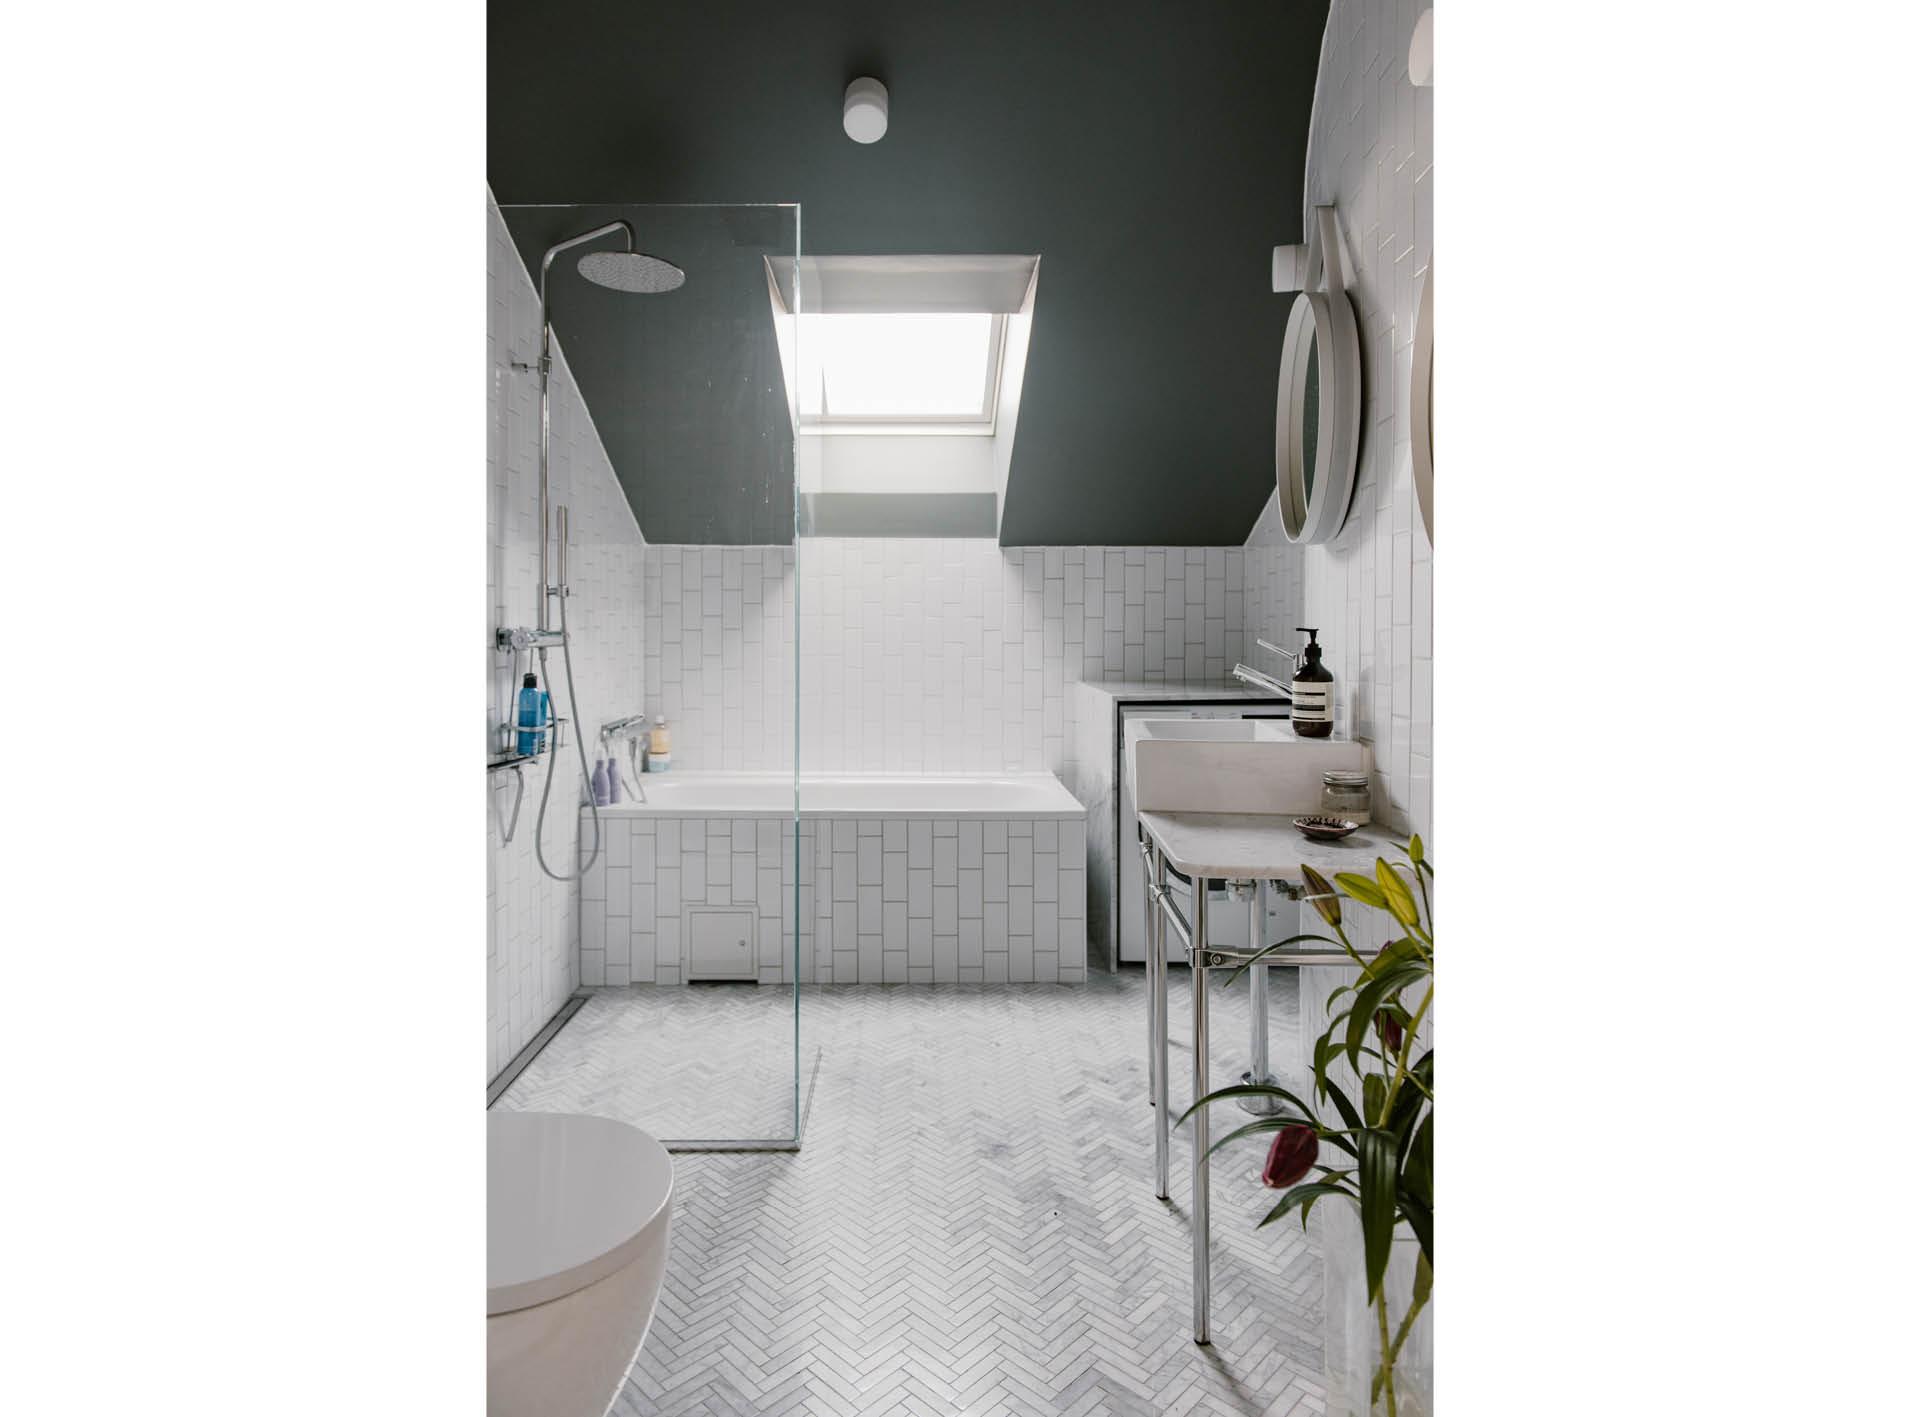 Verrassend leuke, ruime en lichte badkamer   HOMEASE